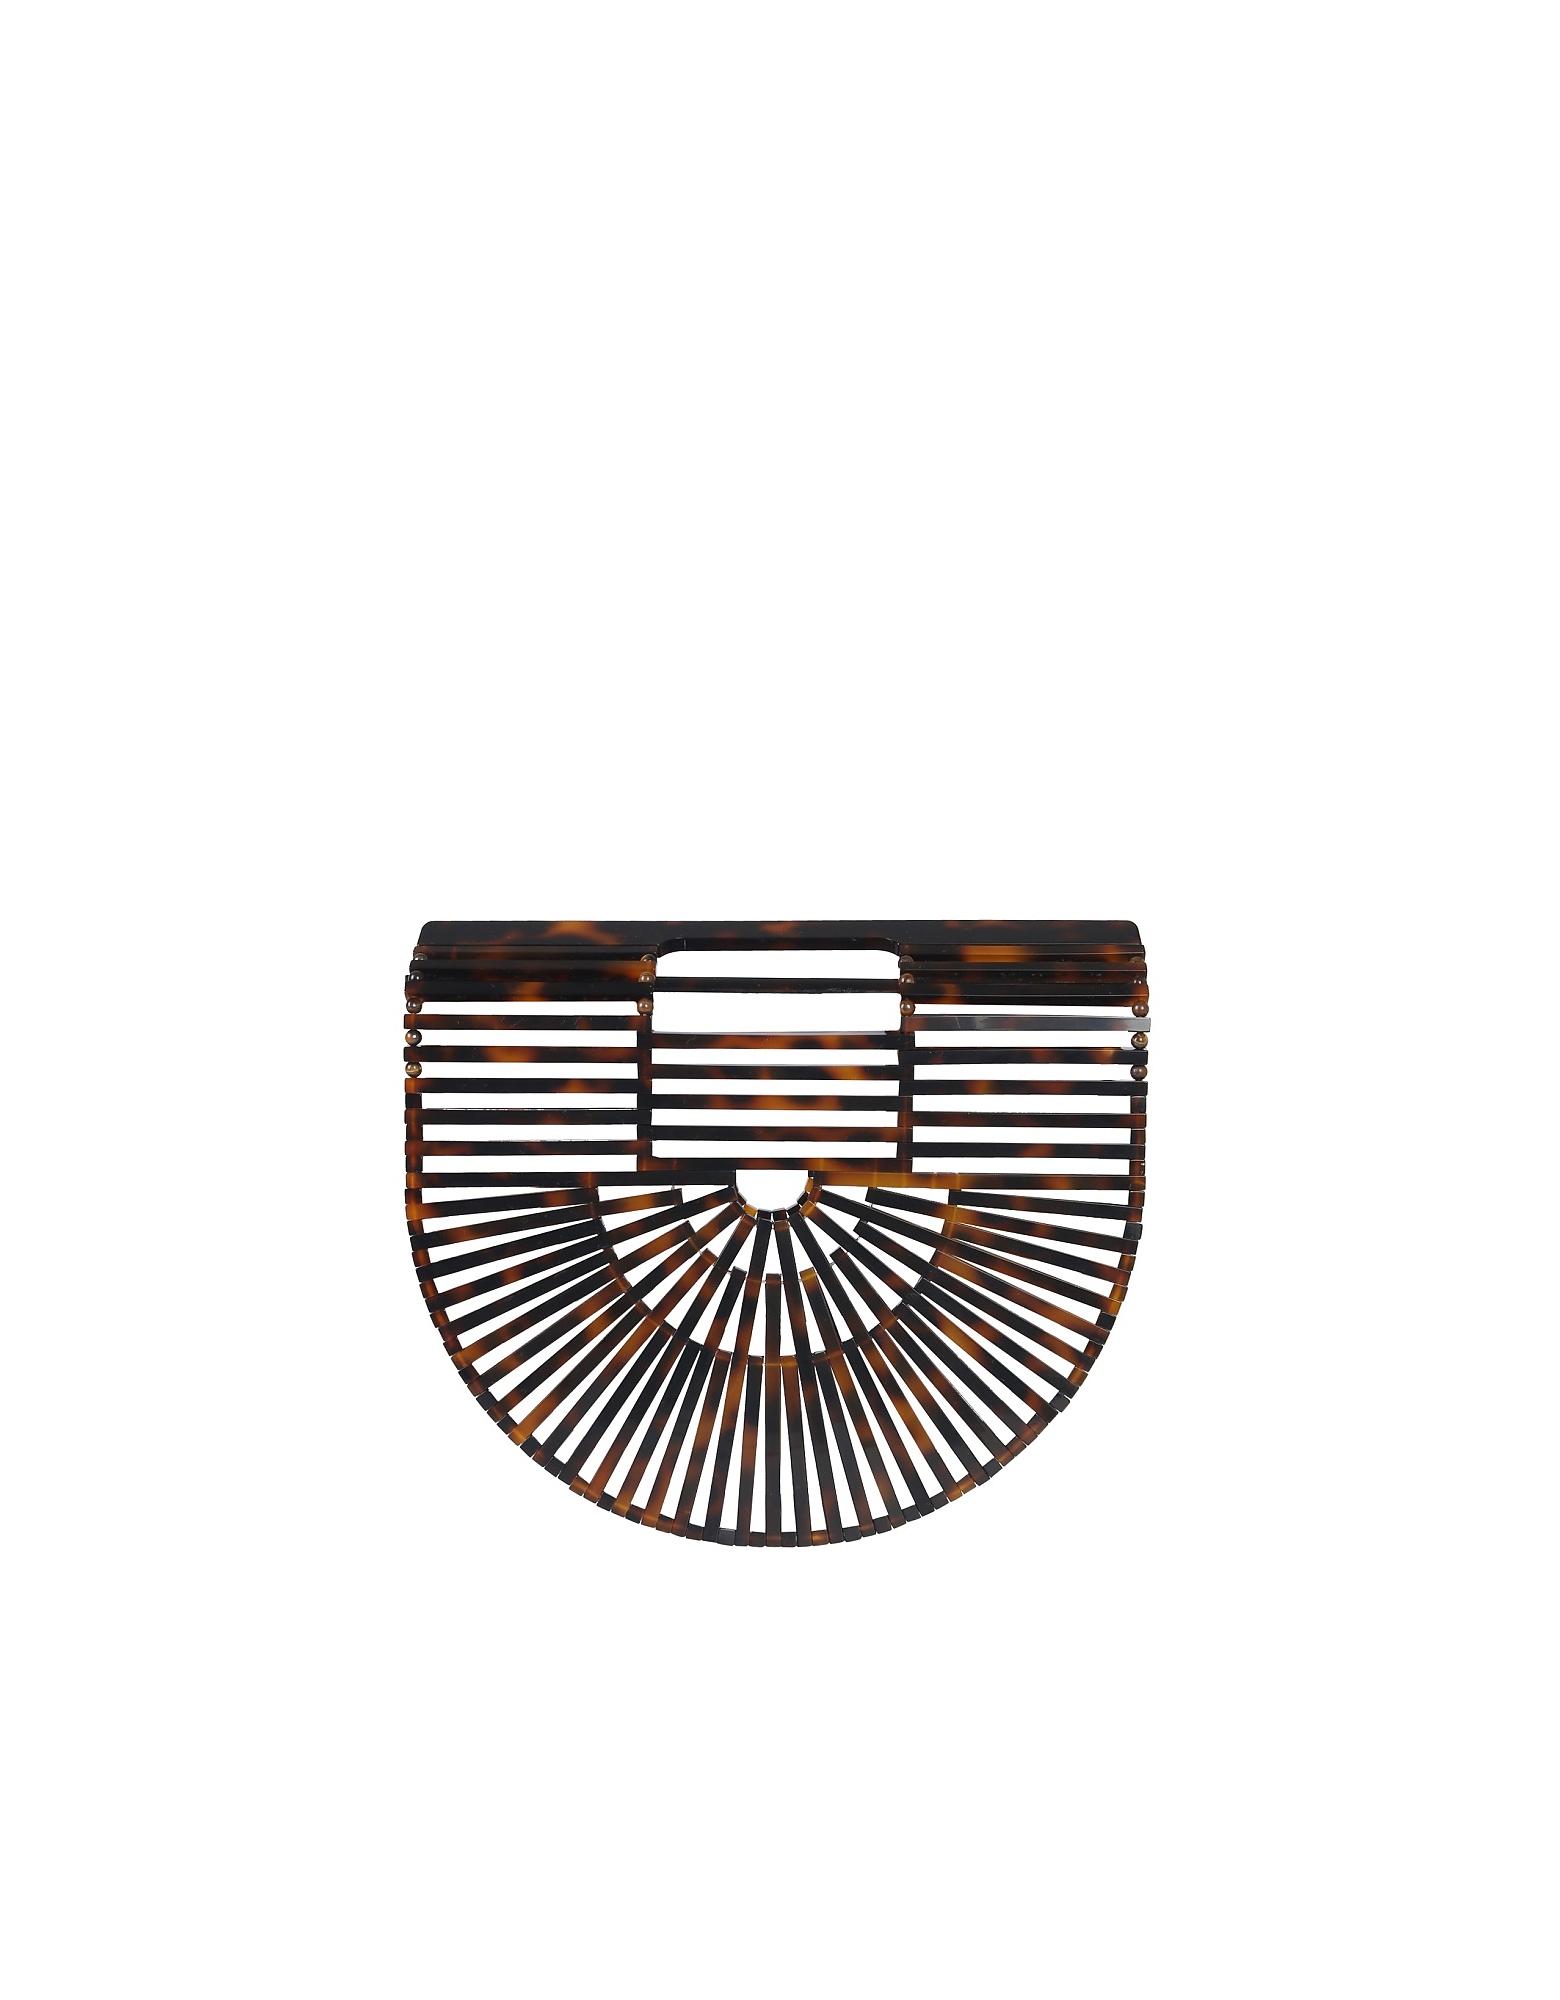 Cult Gaia Designer Handbags, Mini Gaia's Ark Bag